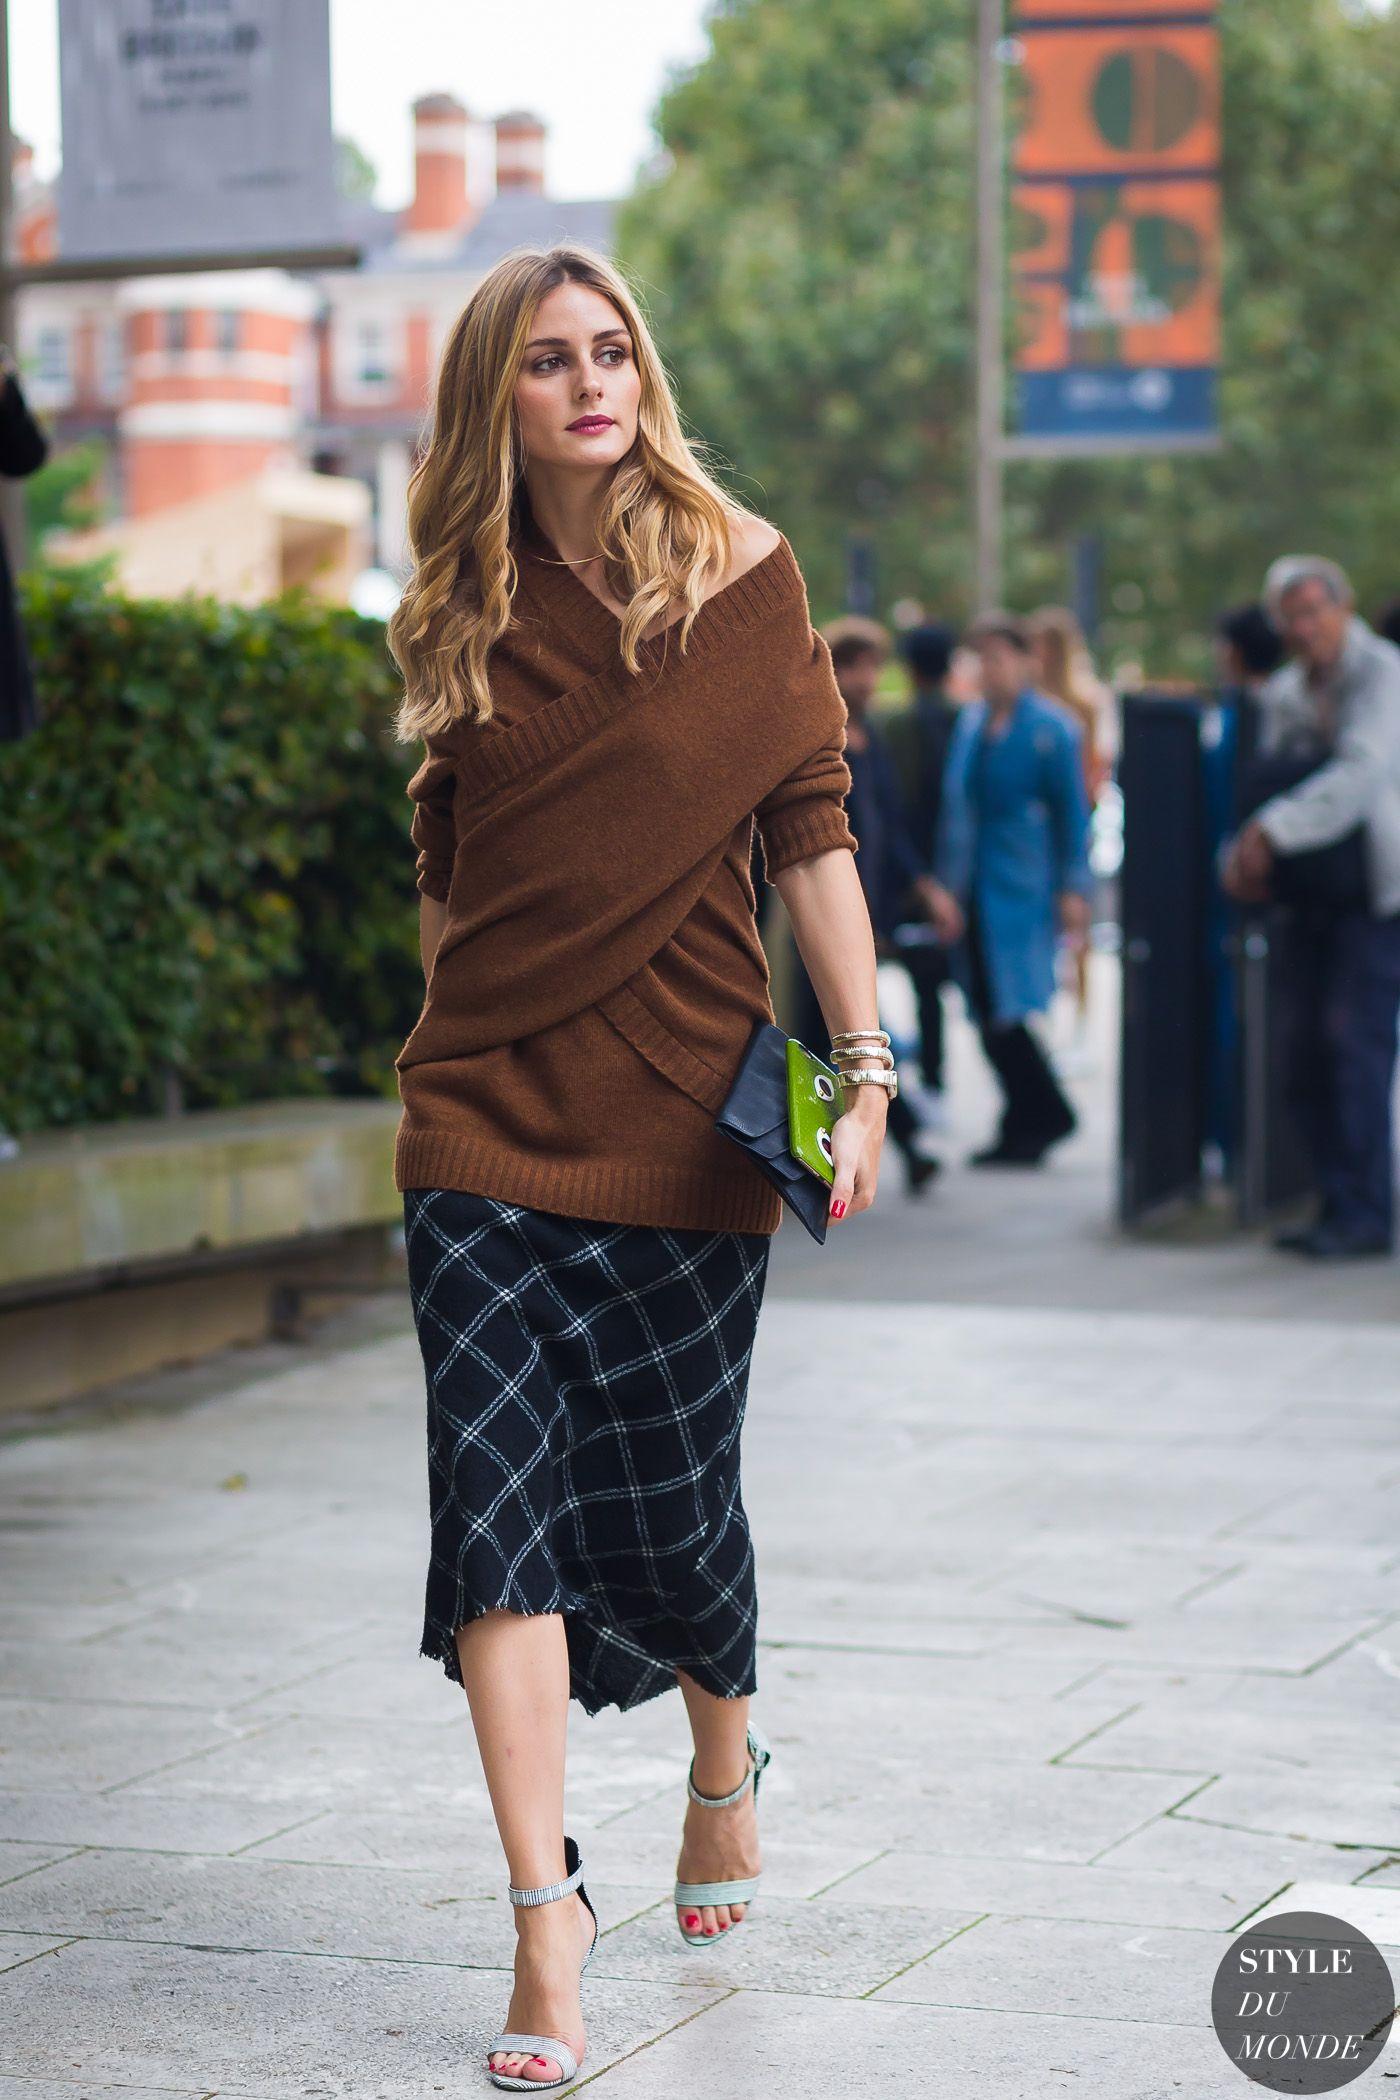 Olivia Palermo By Styledumonde Street Style Fashion Photography Style Du Monde Street Style